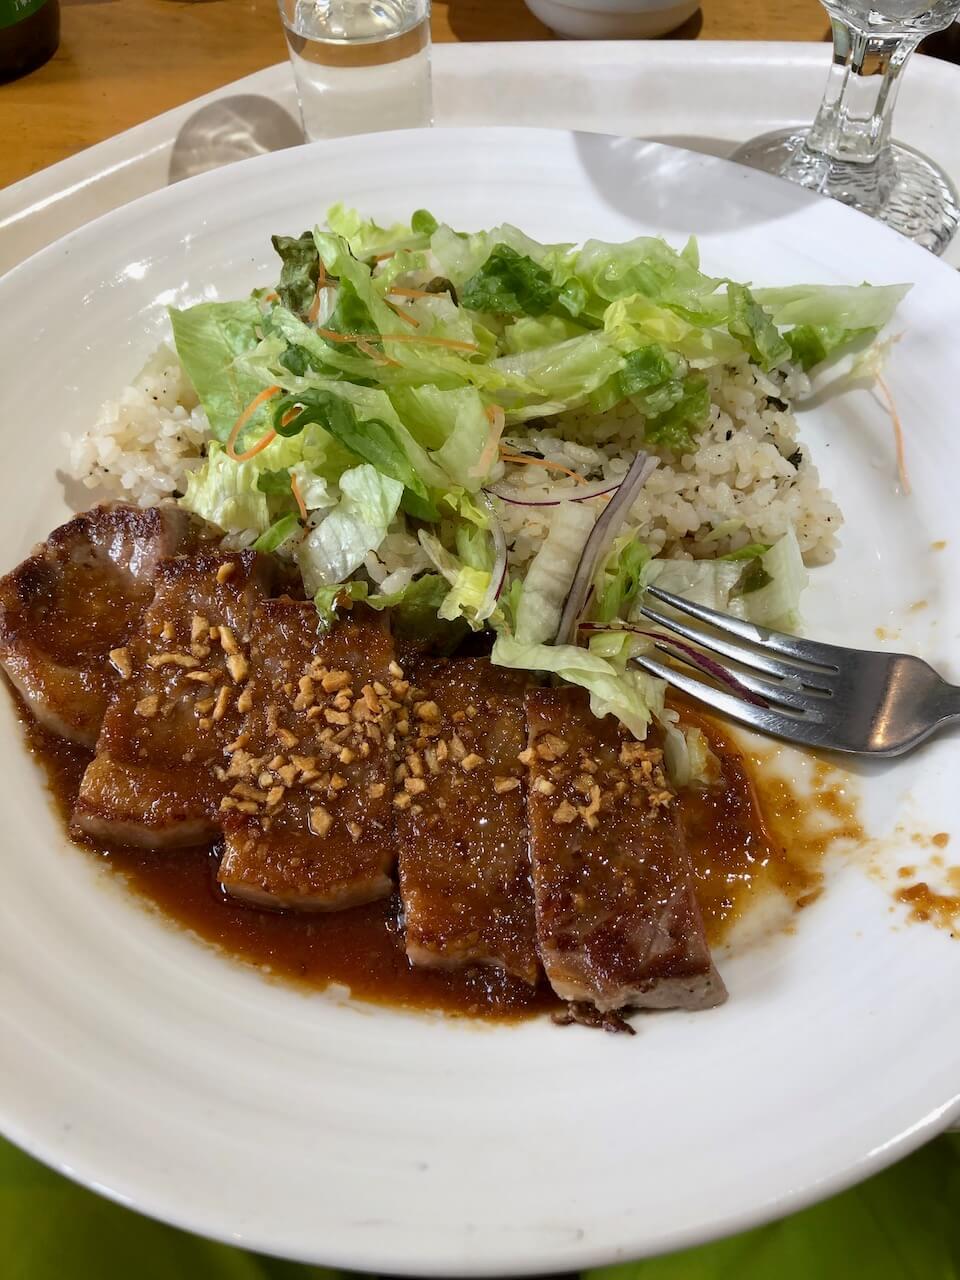 Garlic Steak served at Yamabiko Rest House in Nozawa Onsen Ski Resort.